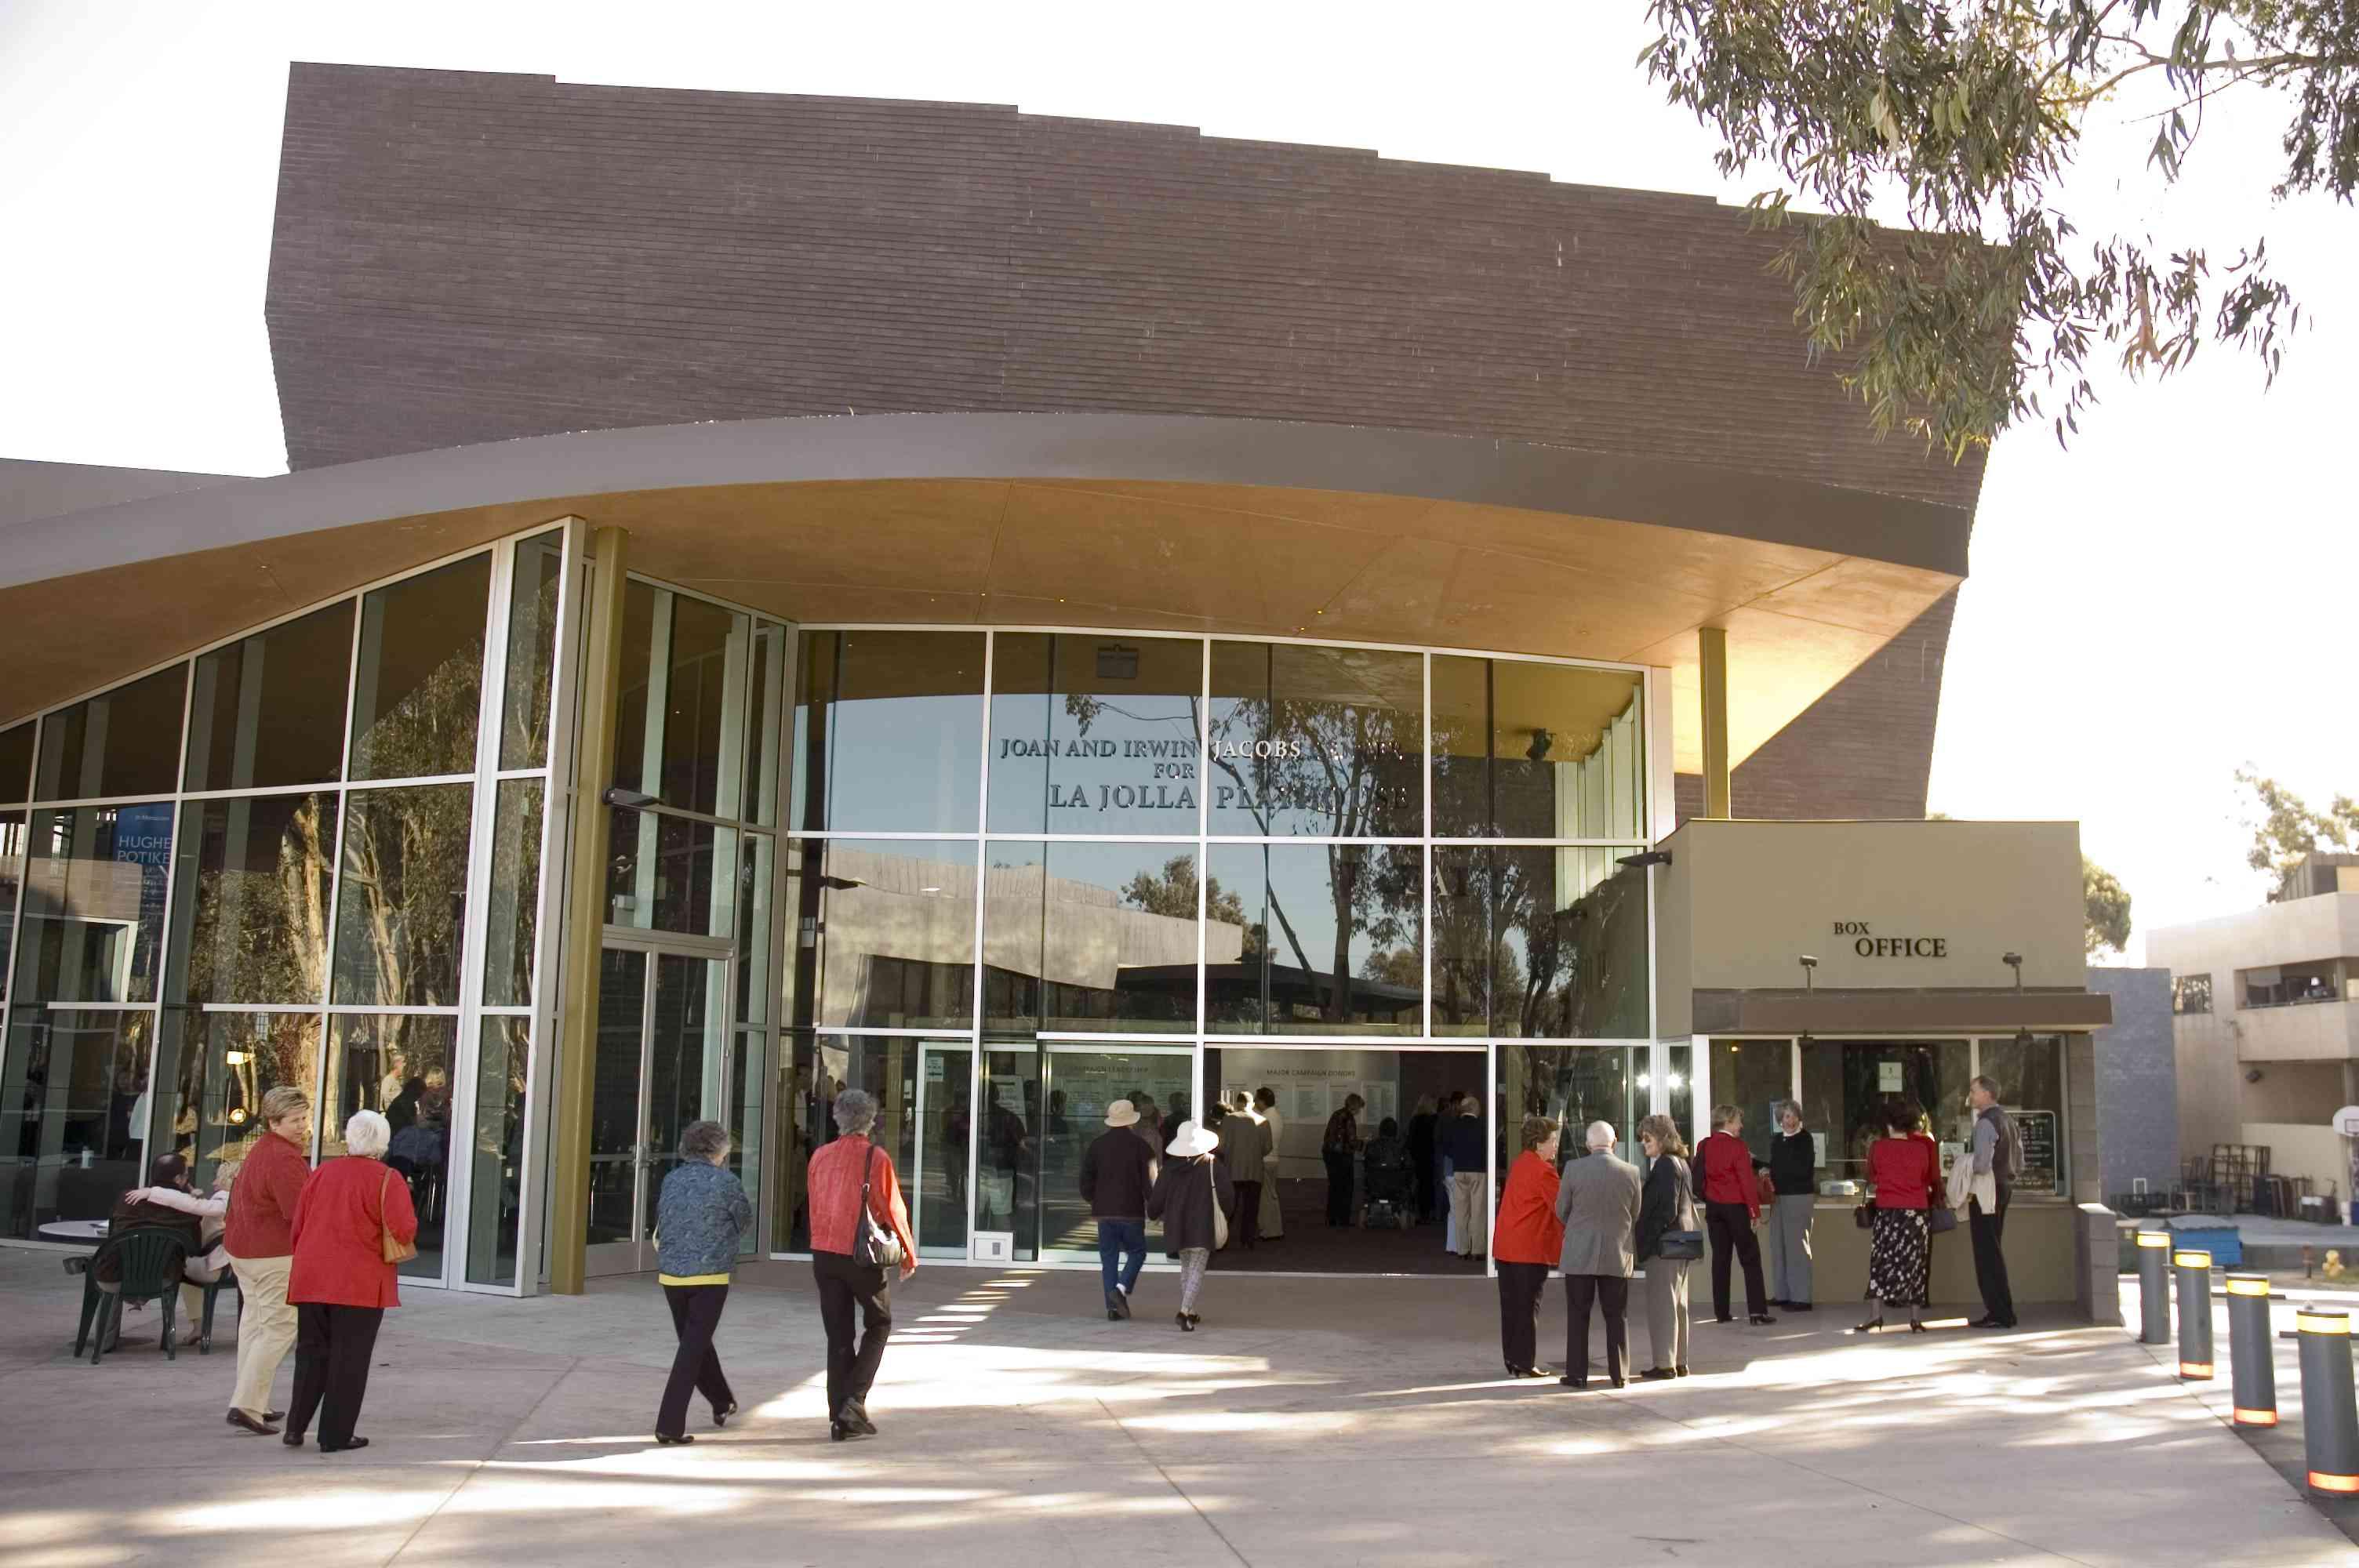 people walking into La Jolla Playhouse